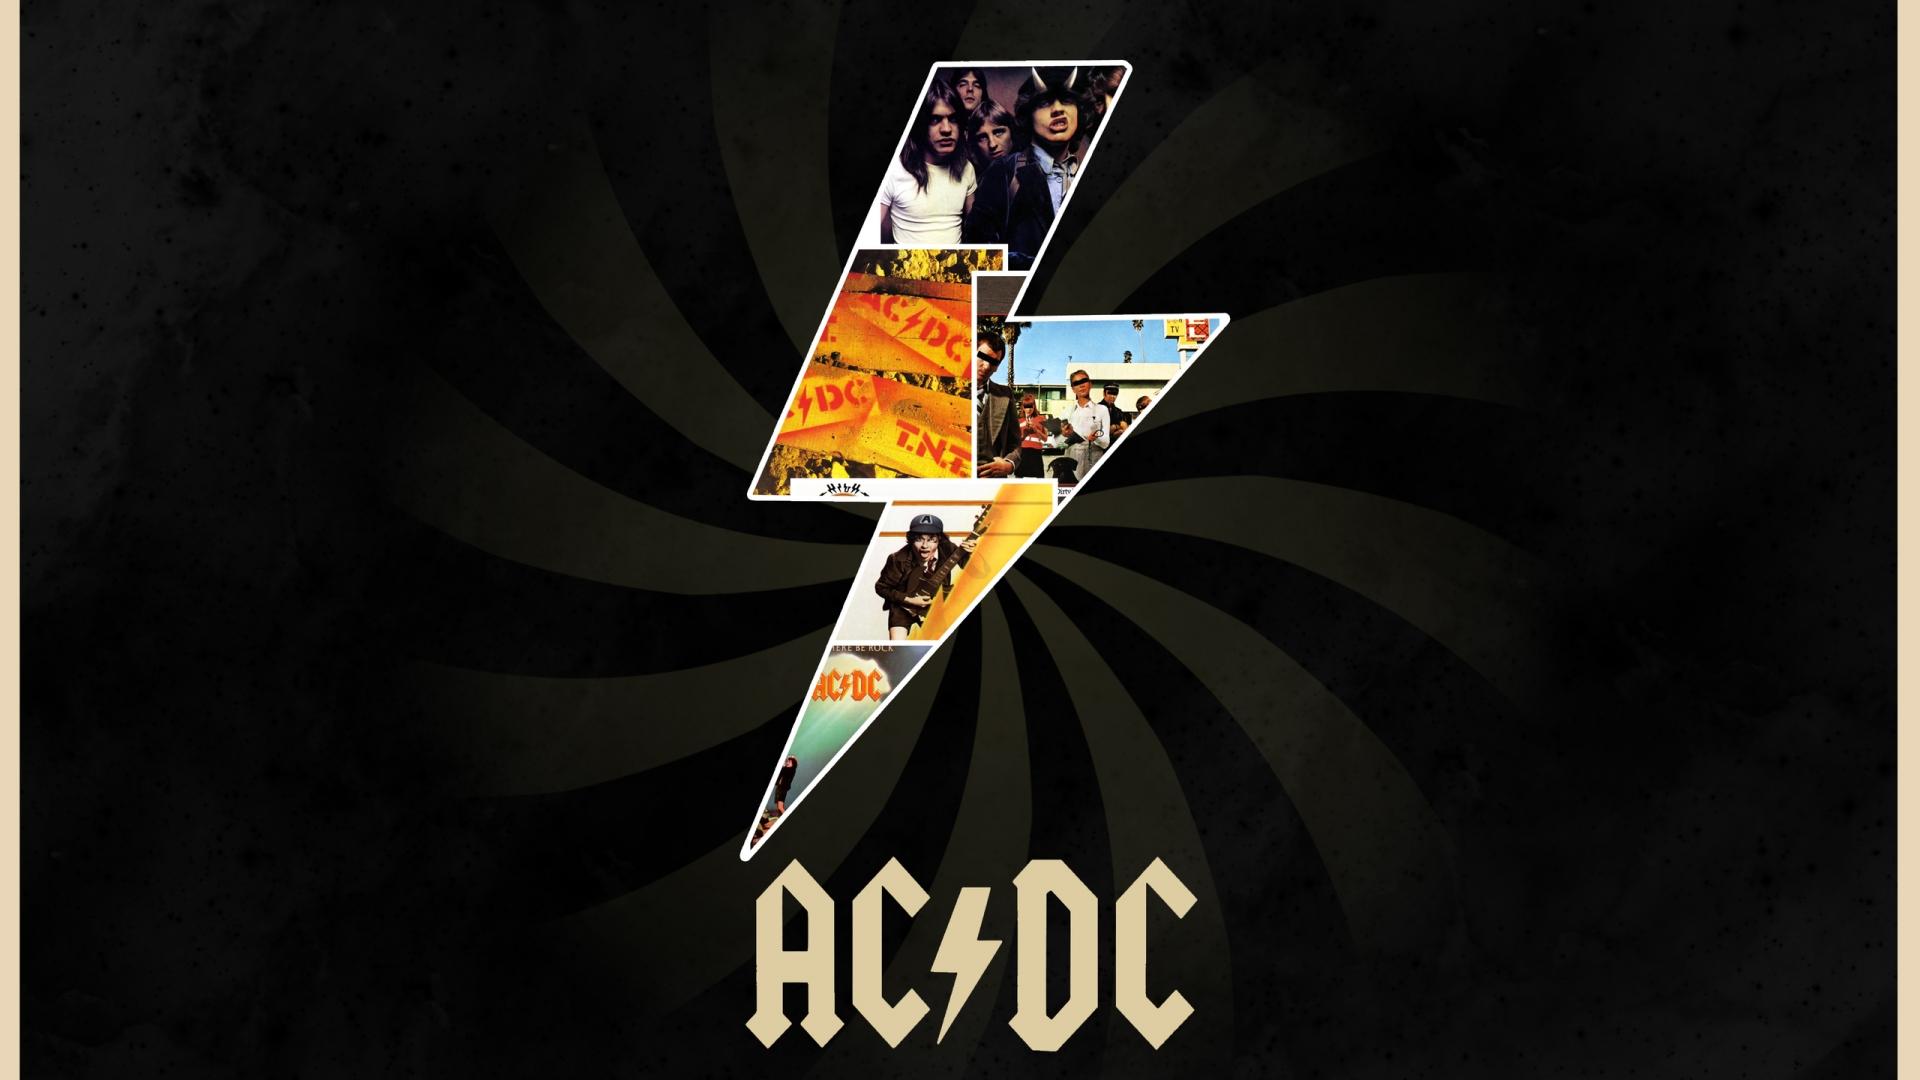 AC / DC Rock - 1920x1080